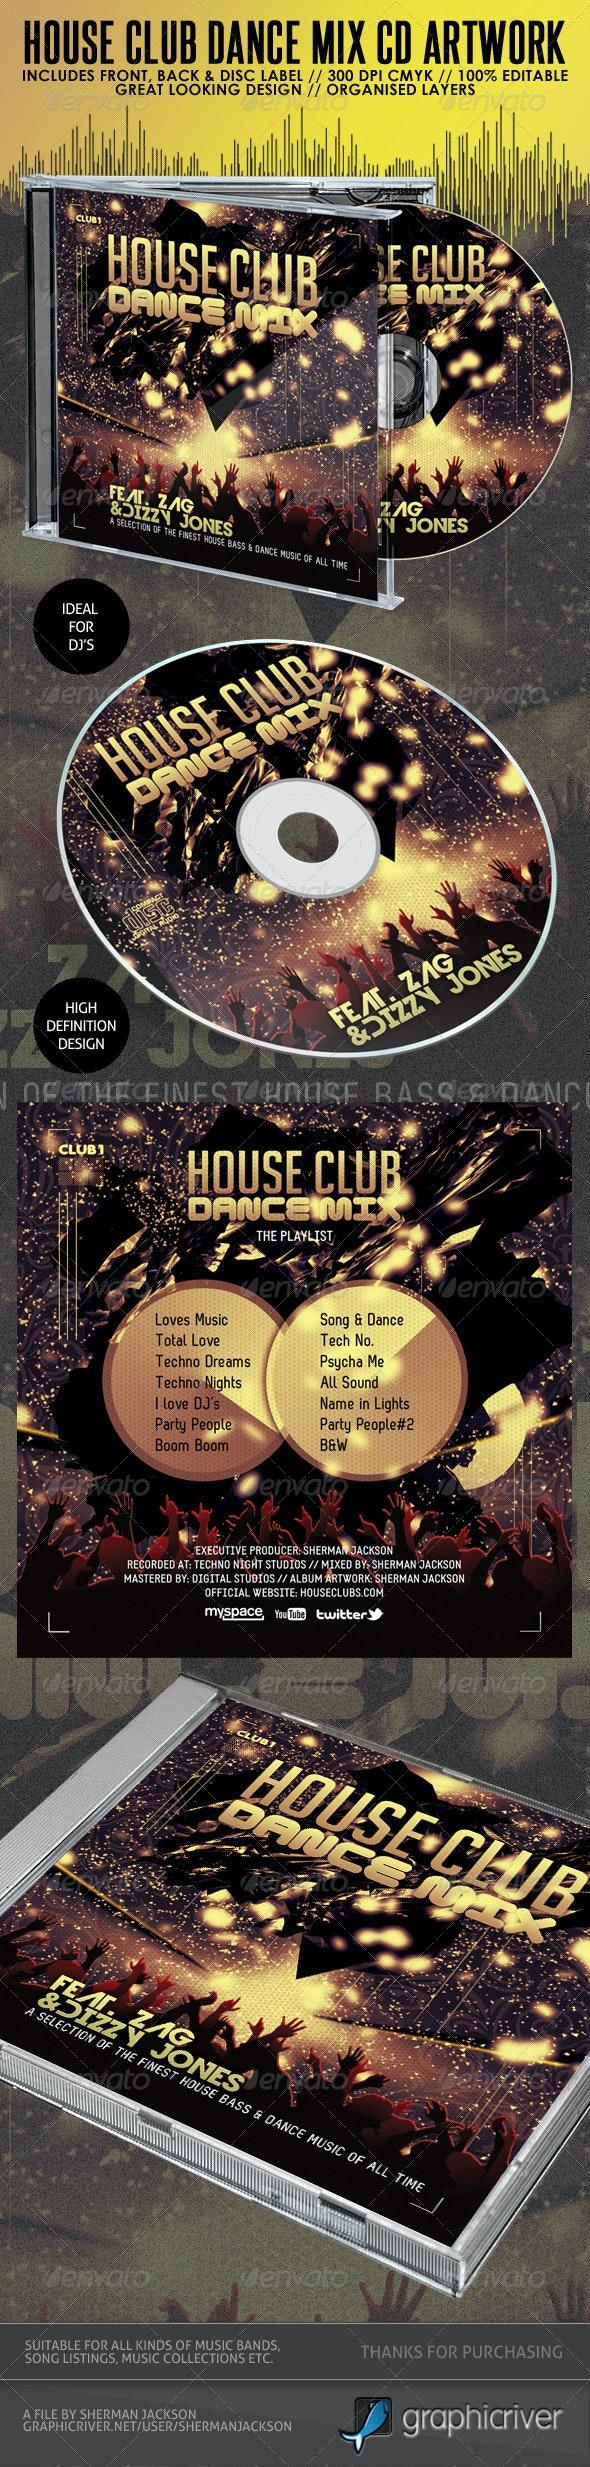 House Club & Dance Mix CD Album Artwork - CD & DVD Artwork Print Templates